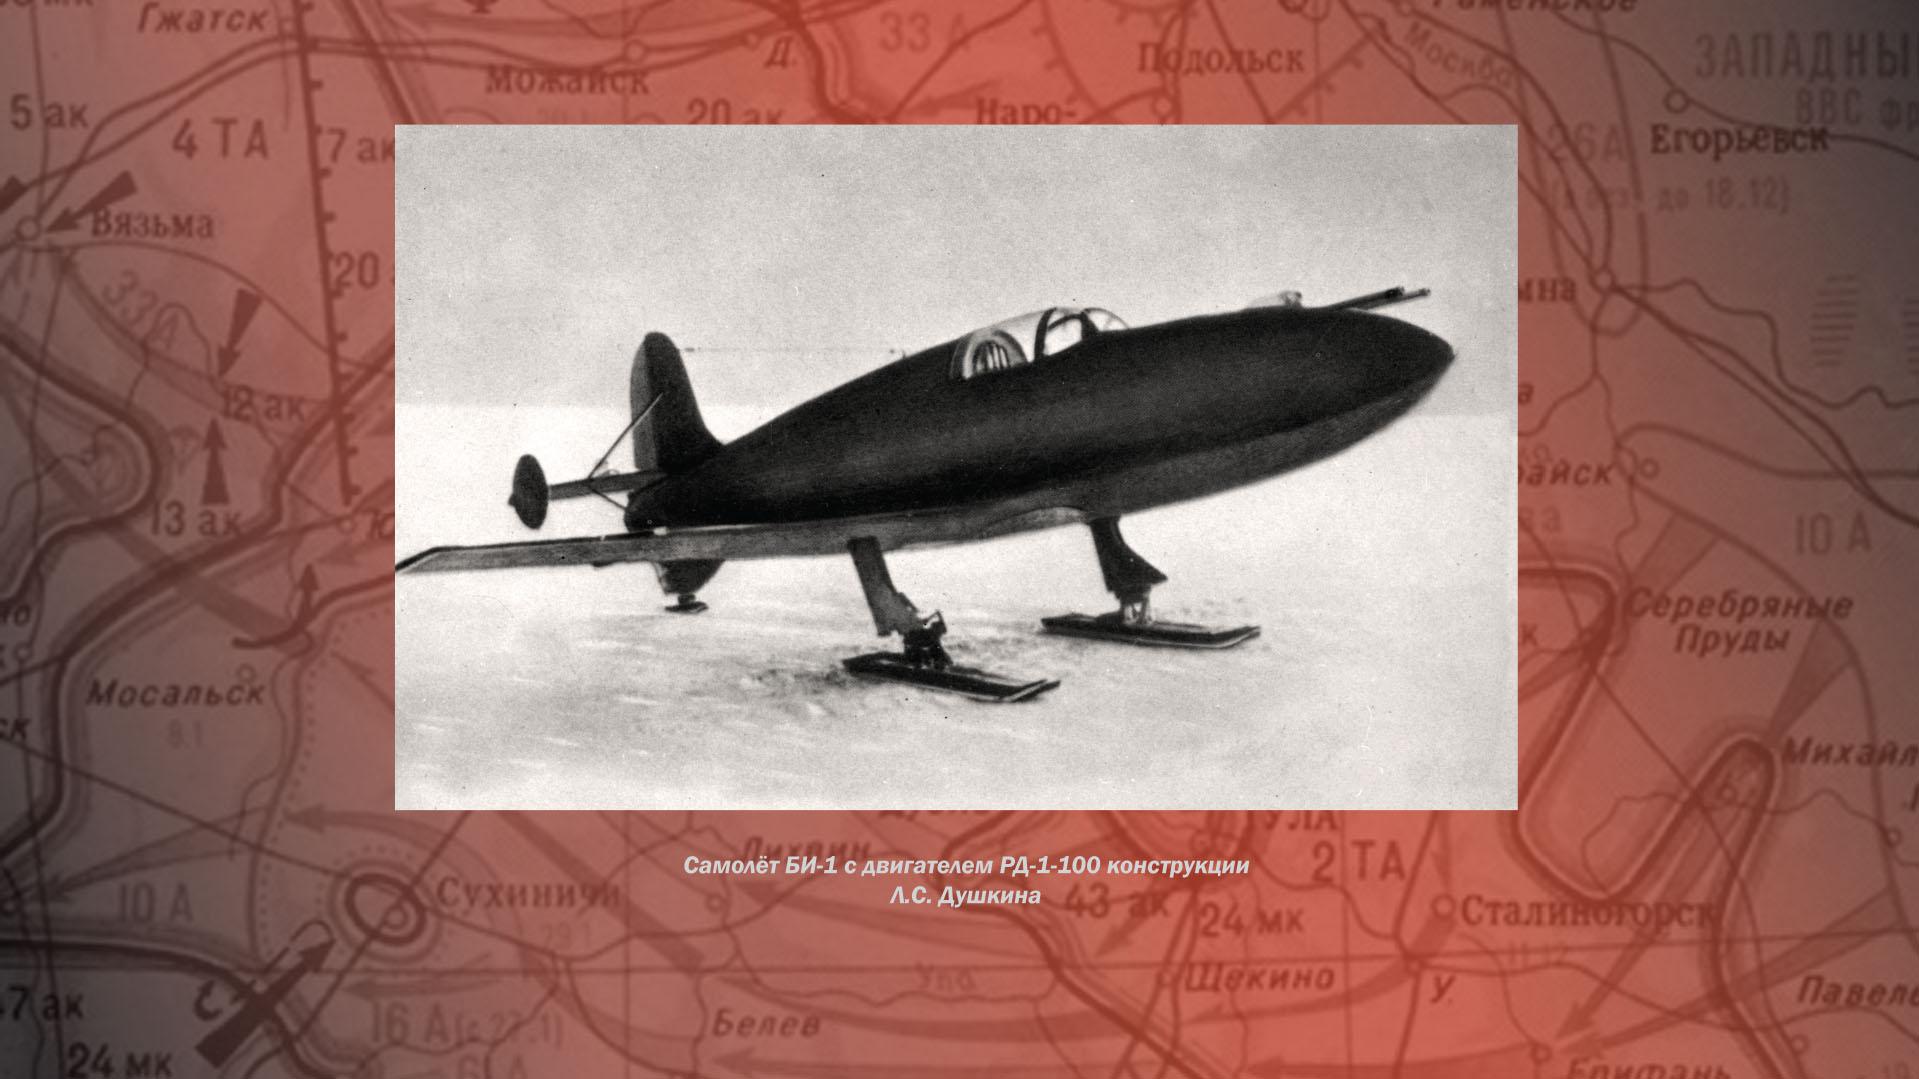 Самолет БИ-1 с двигателем РД-1-100 конструкции  Л.С. Душкина